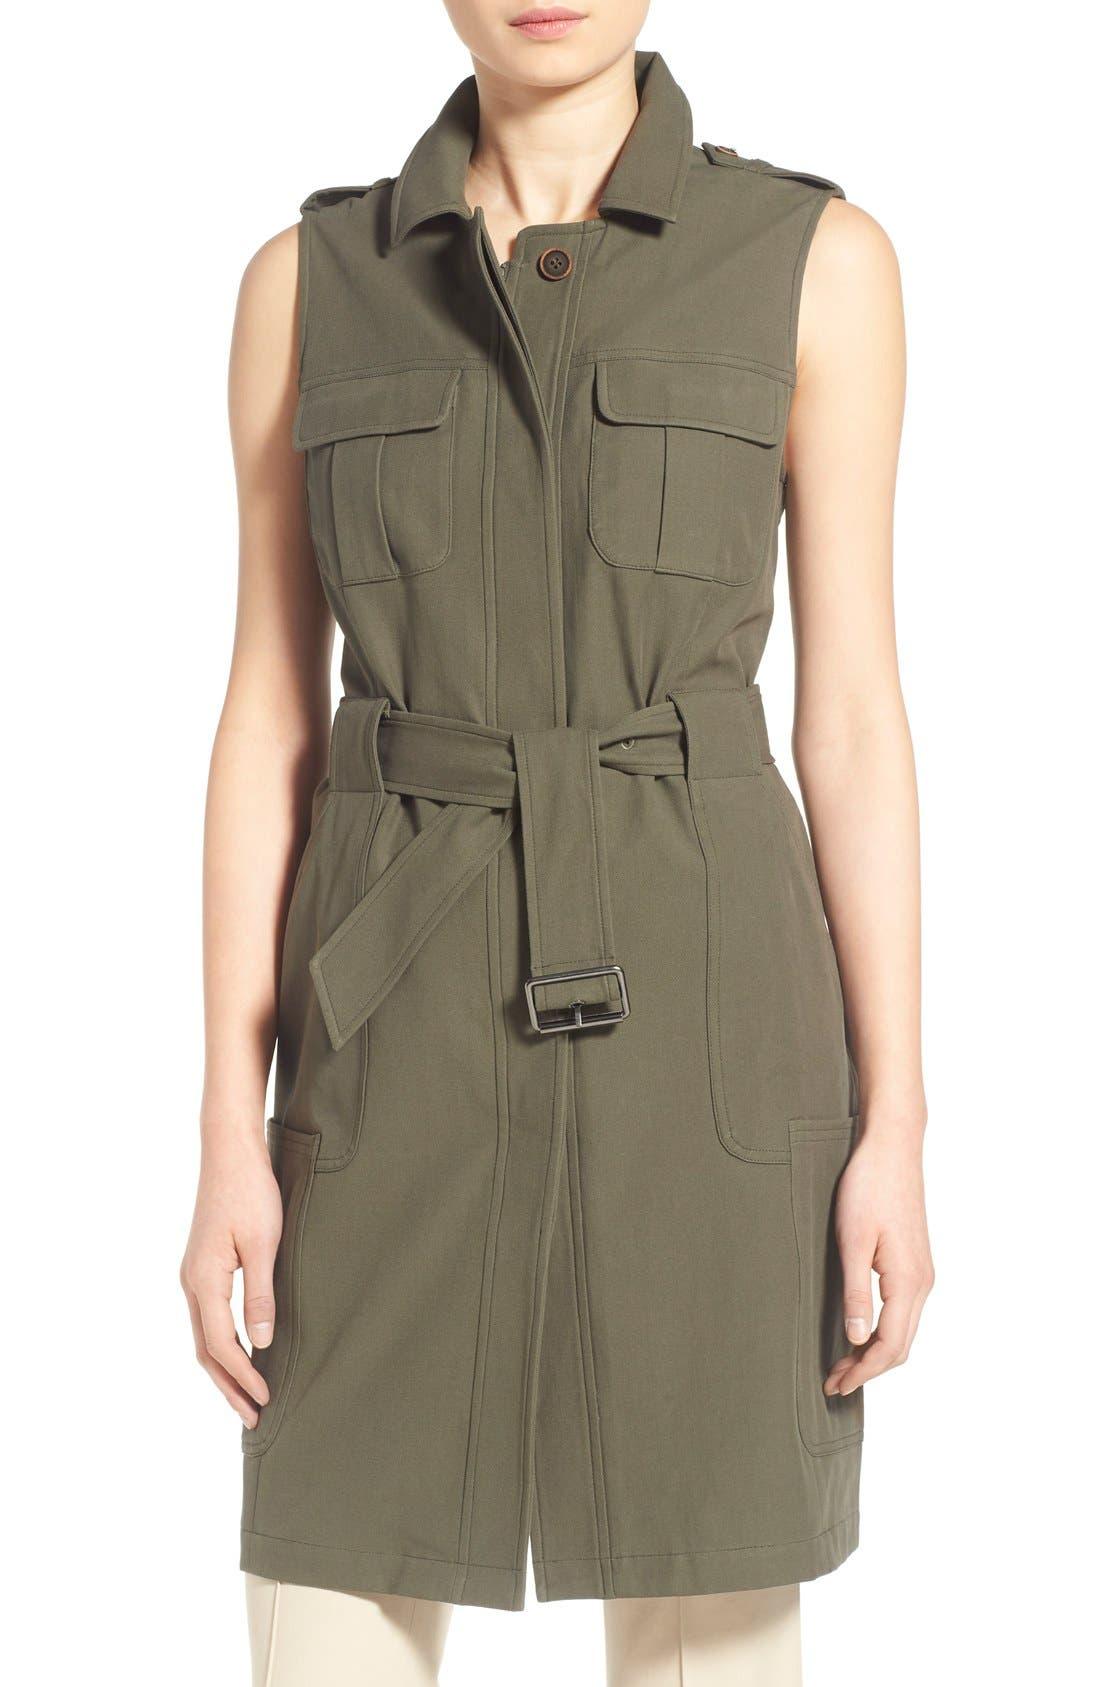 Alternate Image 1 Selected - Olivia Palermo + Chelsea28 Long Military Vest